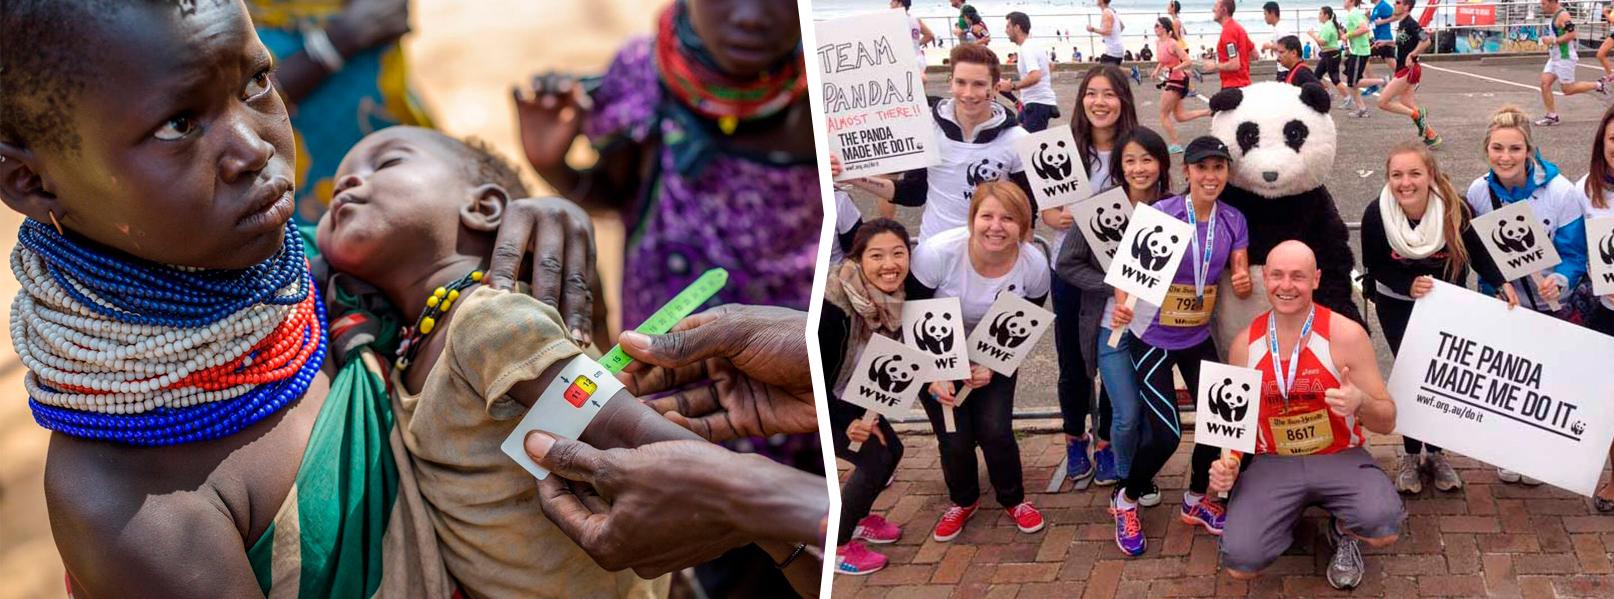 Дети Африка. Защита панды.